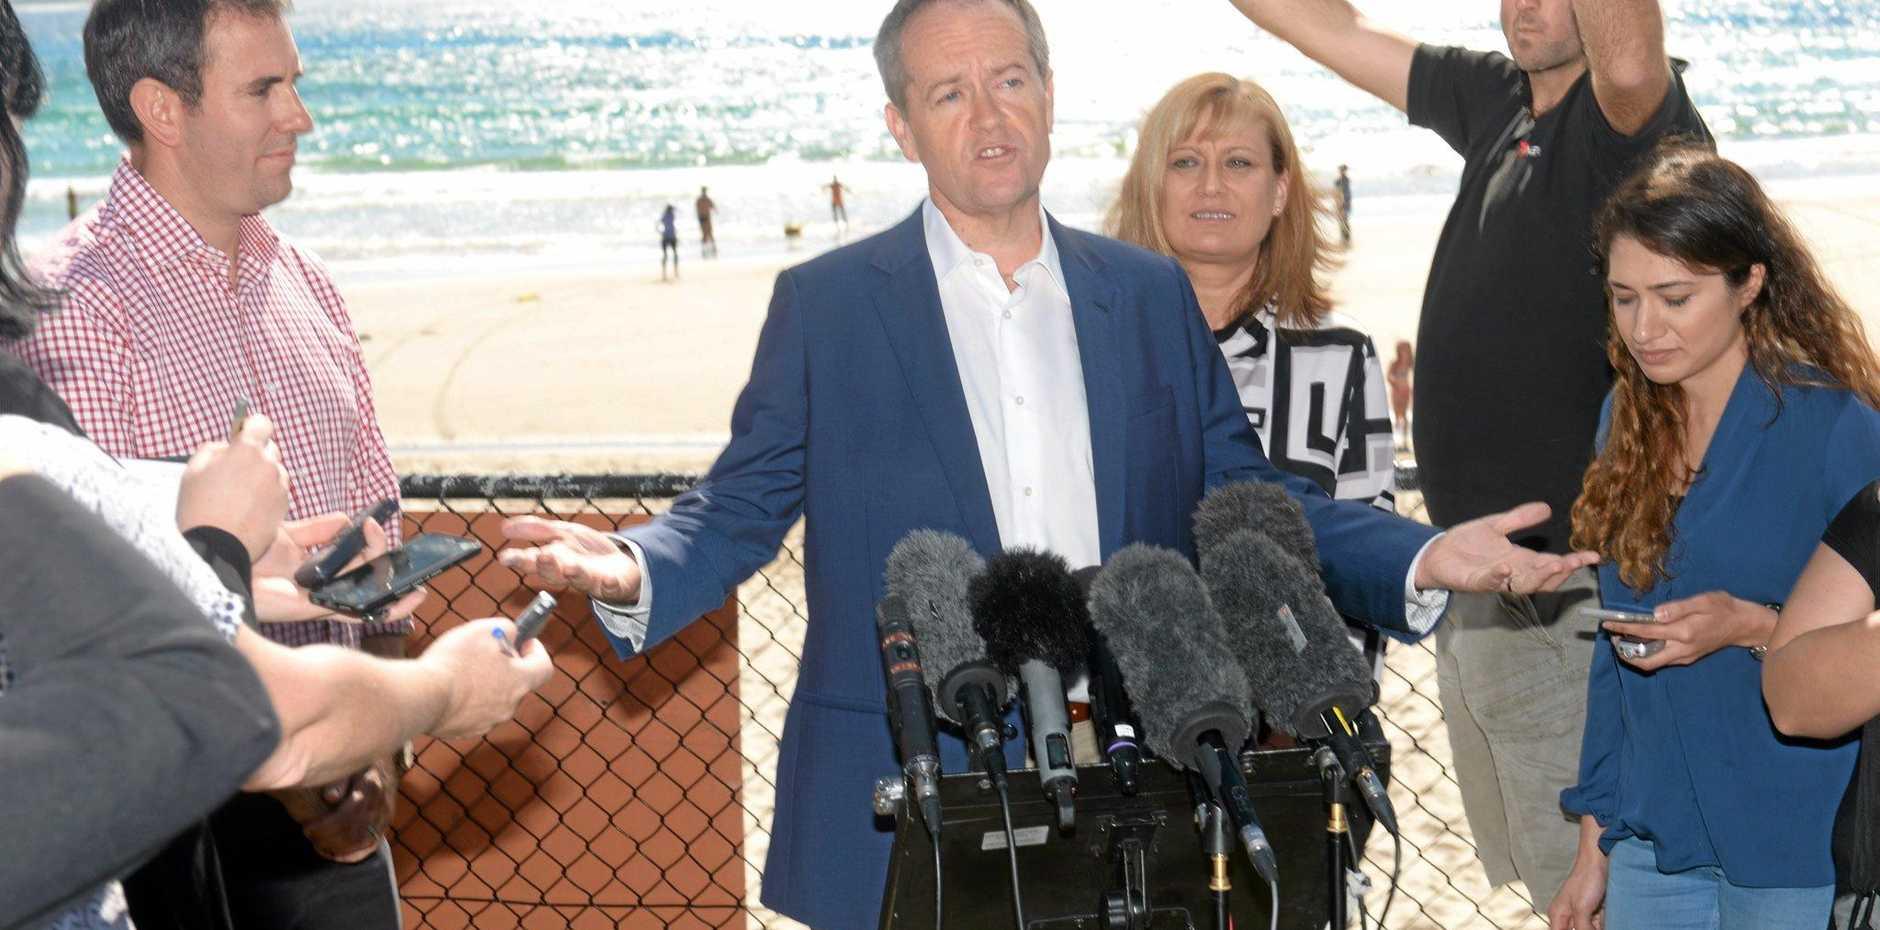 Opposition leader Bill Shorten with Richmond MP Justine Elliot in Kingscliff on Sunday, May 15, 2016.